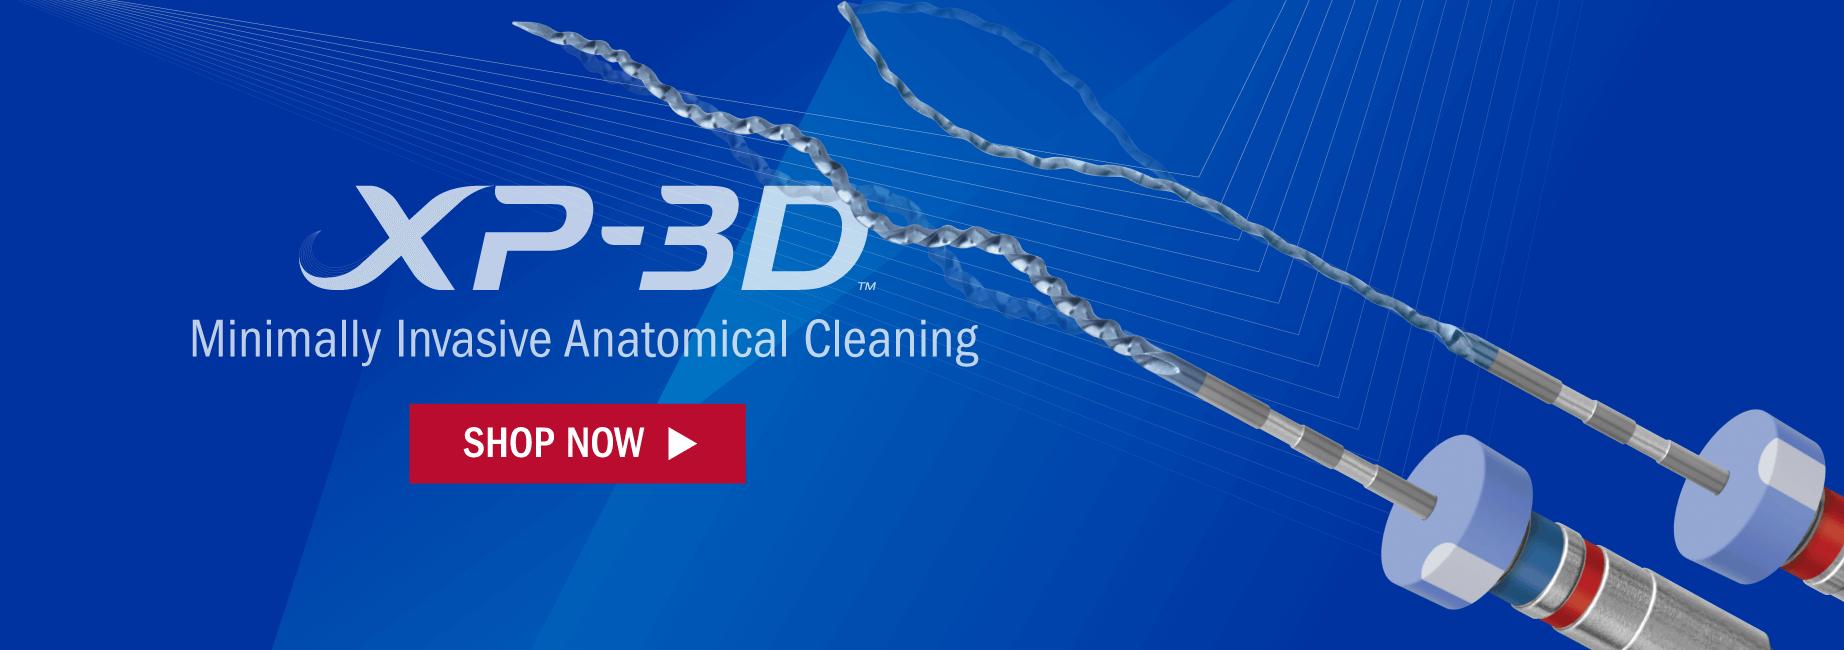 XP-3D Endodontic Instrumentation. Minimally Invasive Anatomical Cleaning